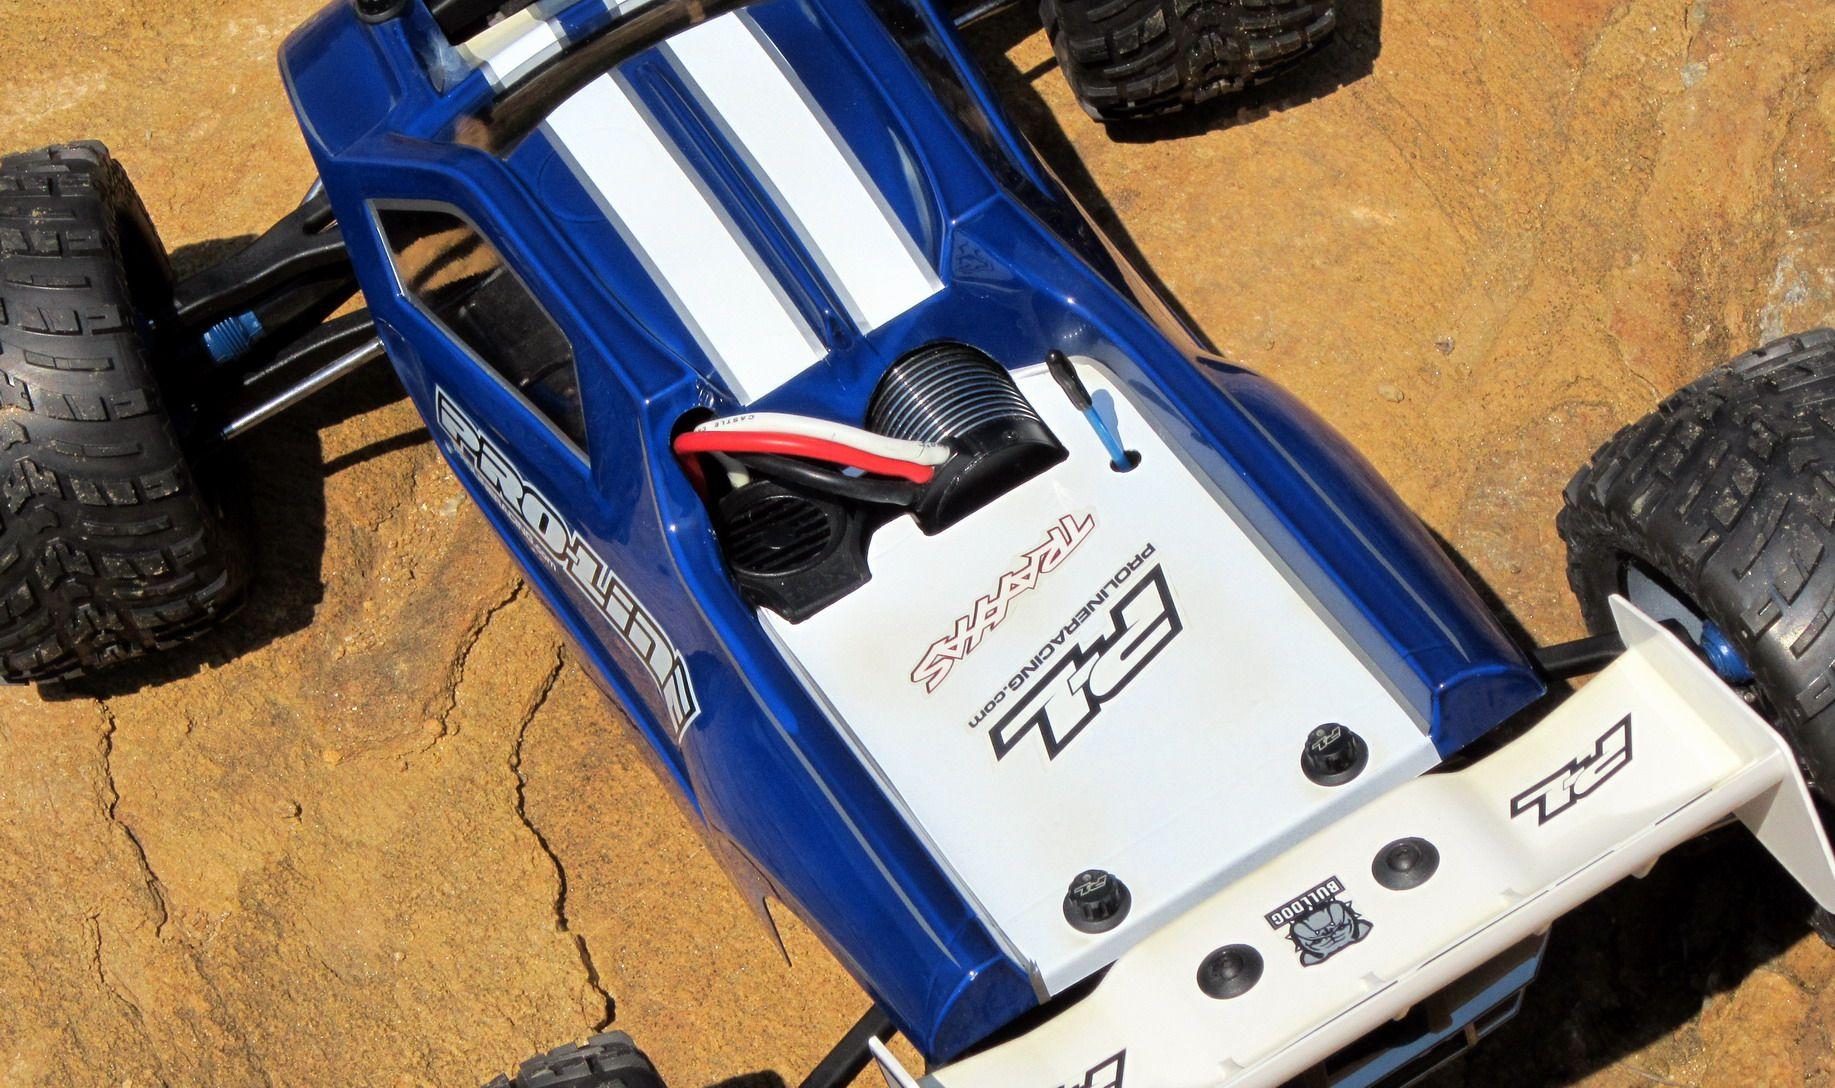 Pro Line Bulldog Truggy Conversion For Your Traxxas E Revo Brushless Pro Line Factory Team E Revo Traxxas Revo